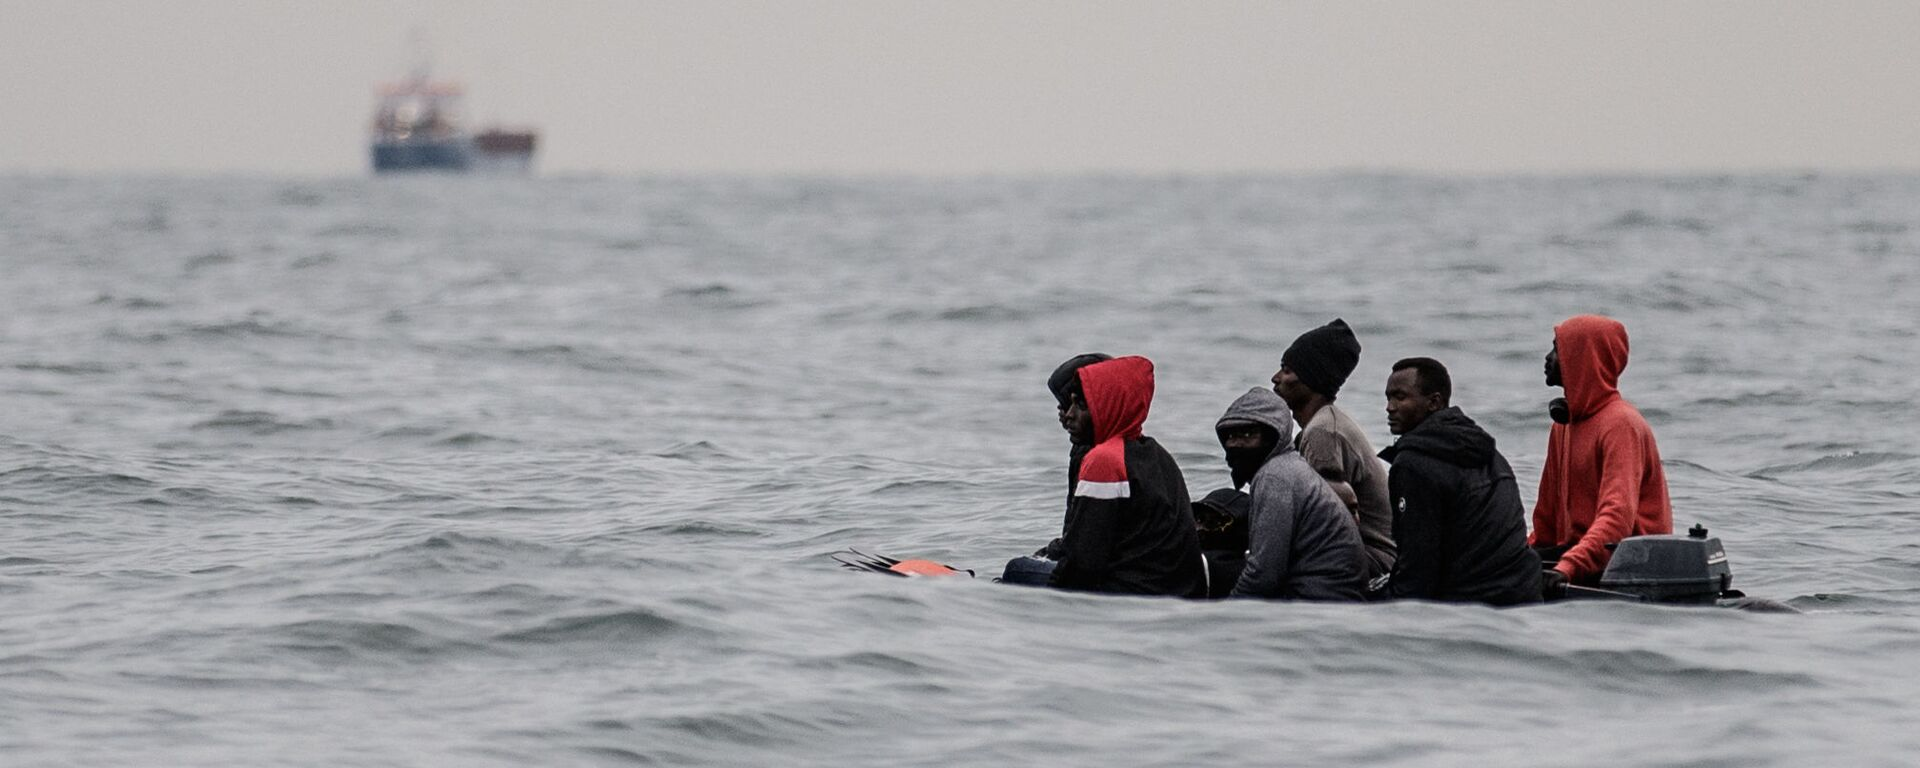 Migranti attraversano la Manica - Sputnik Italia, 1920, 09.08.2021